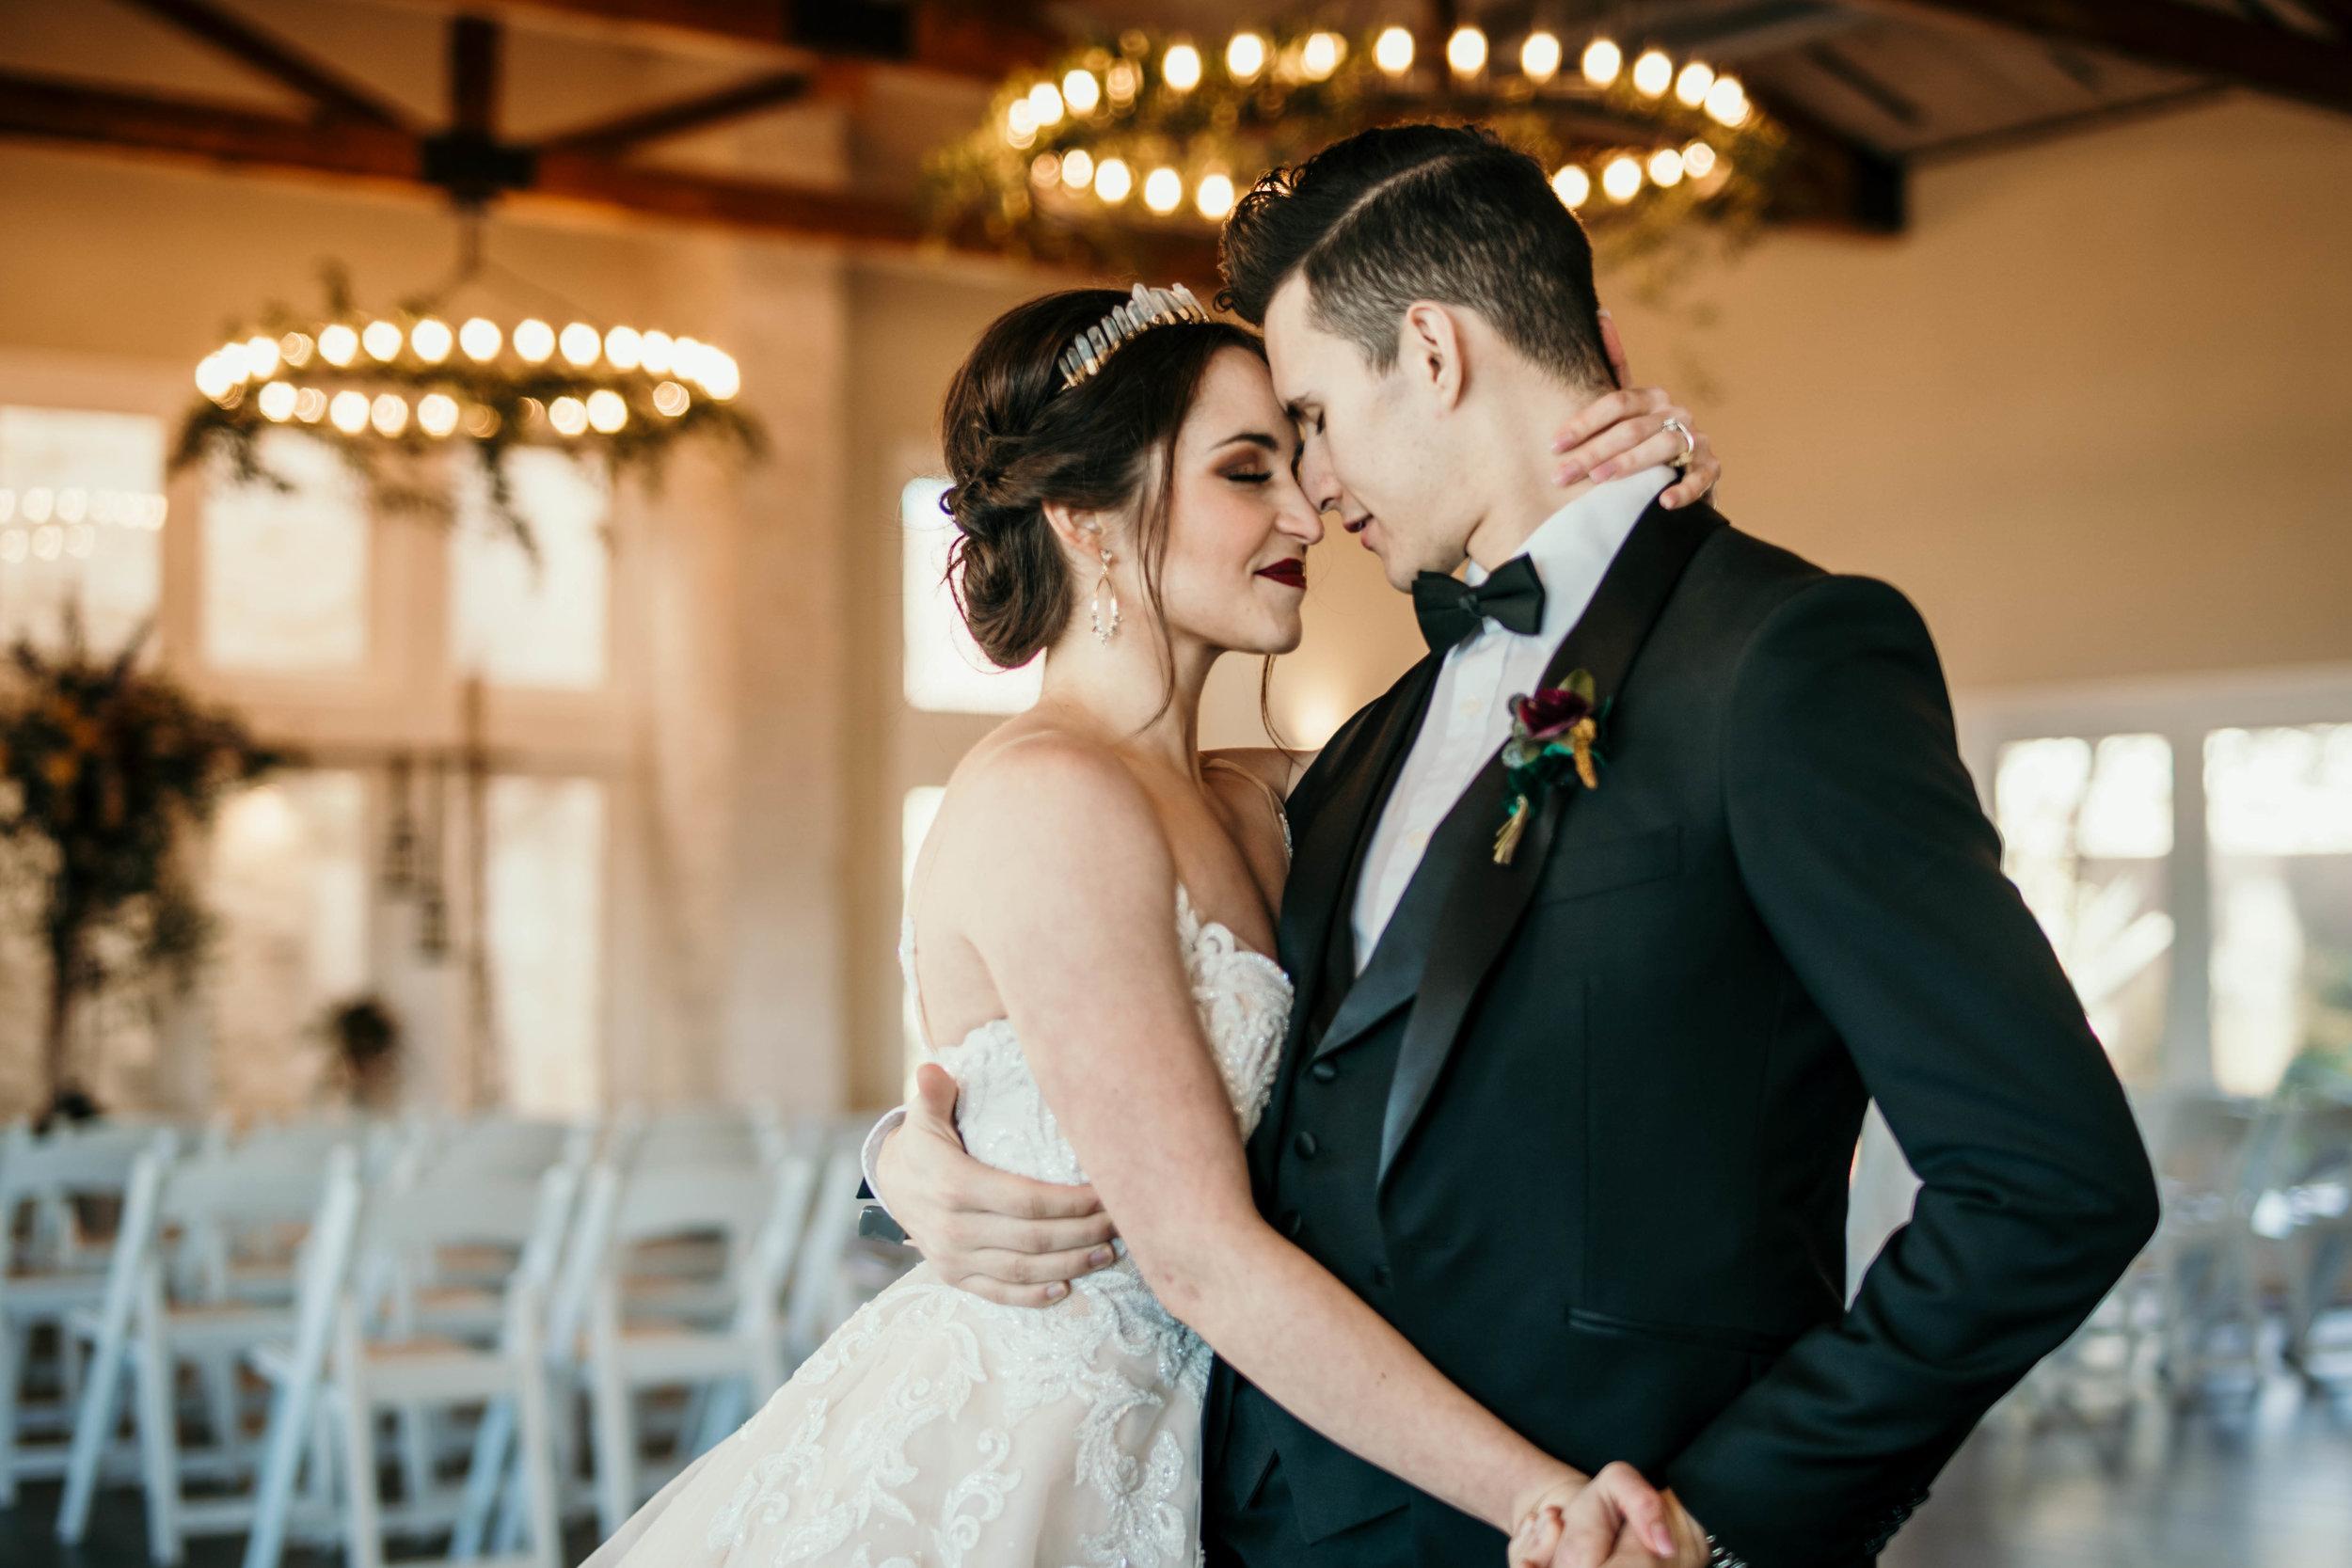 Austin Wedding Videographer - Dolls for Dolls (301 of 323).jpg